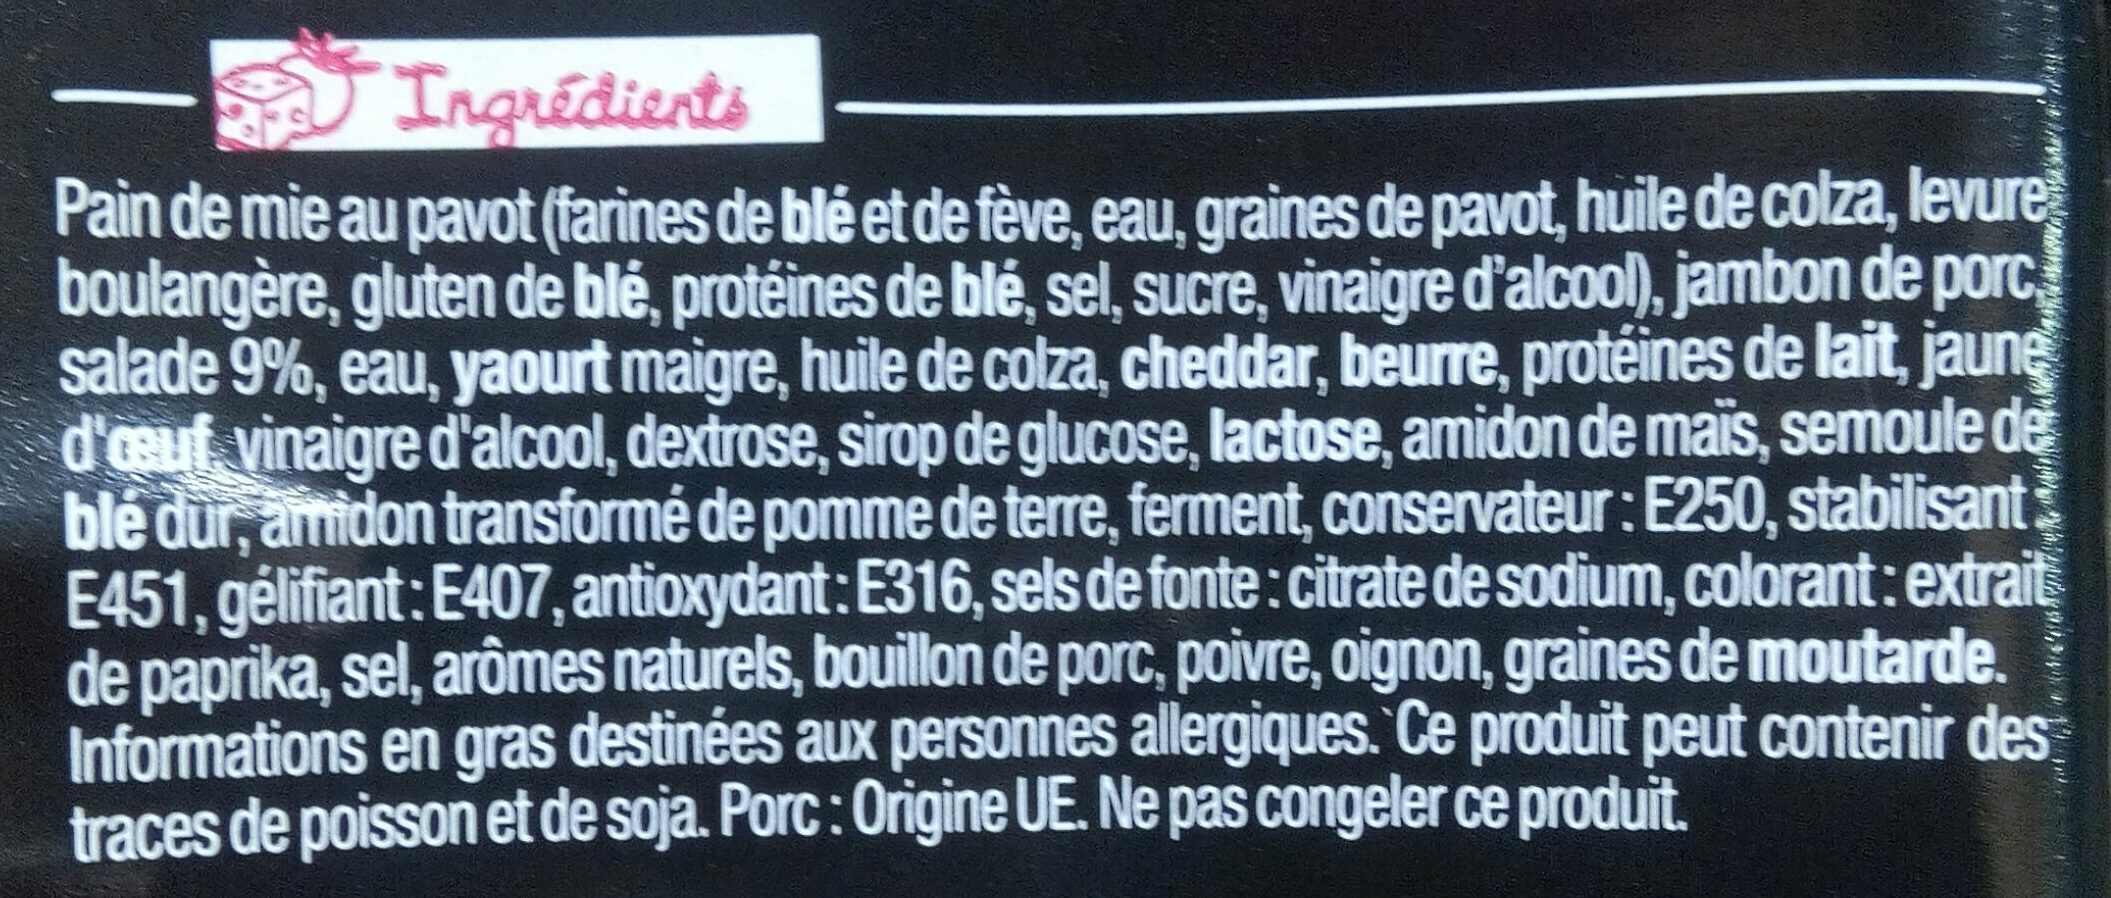 Sandwich Le Gourmand  Club - Jambon Cheddar - Ingrédients